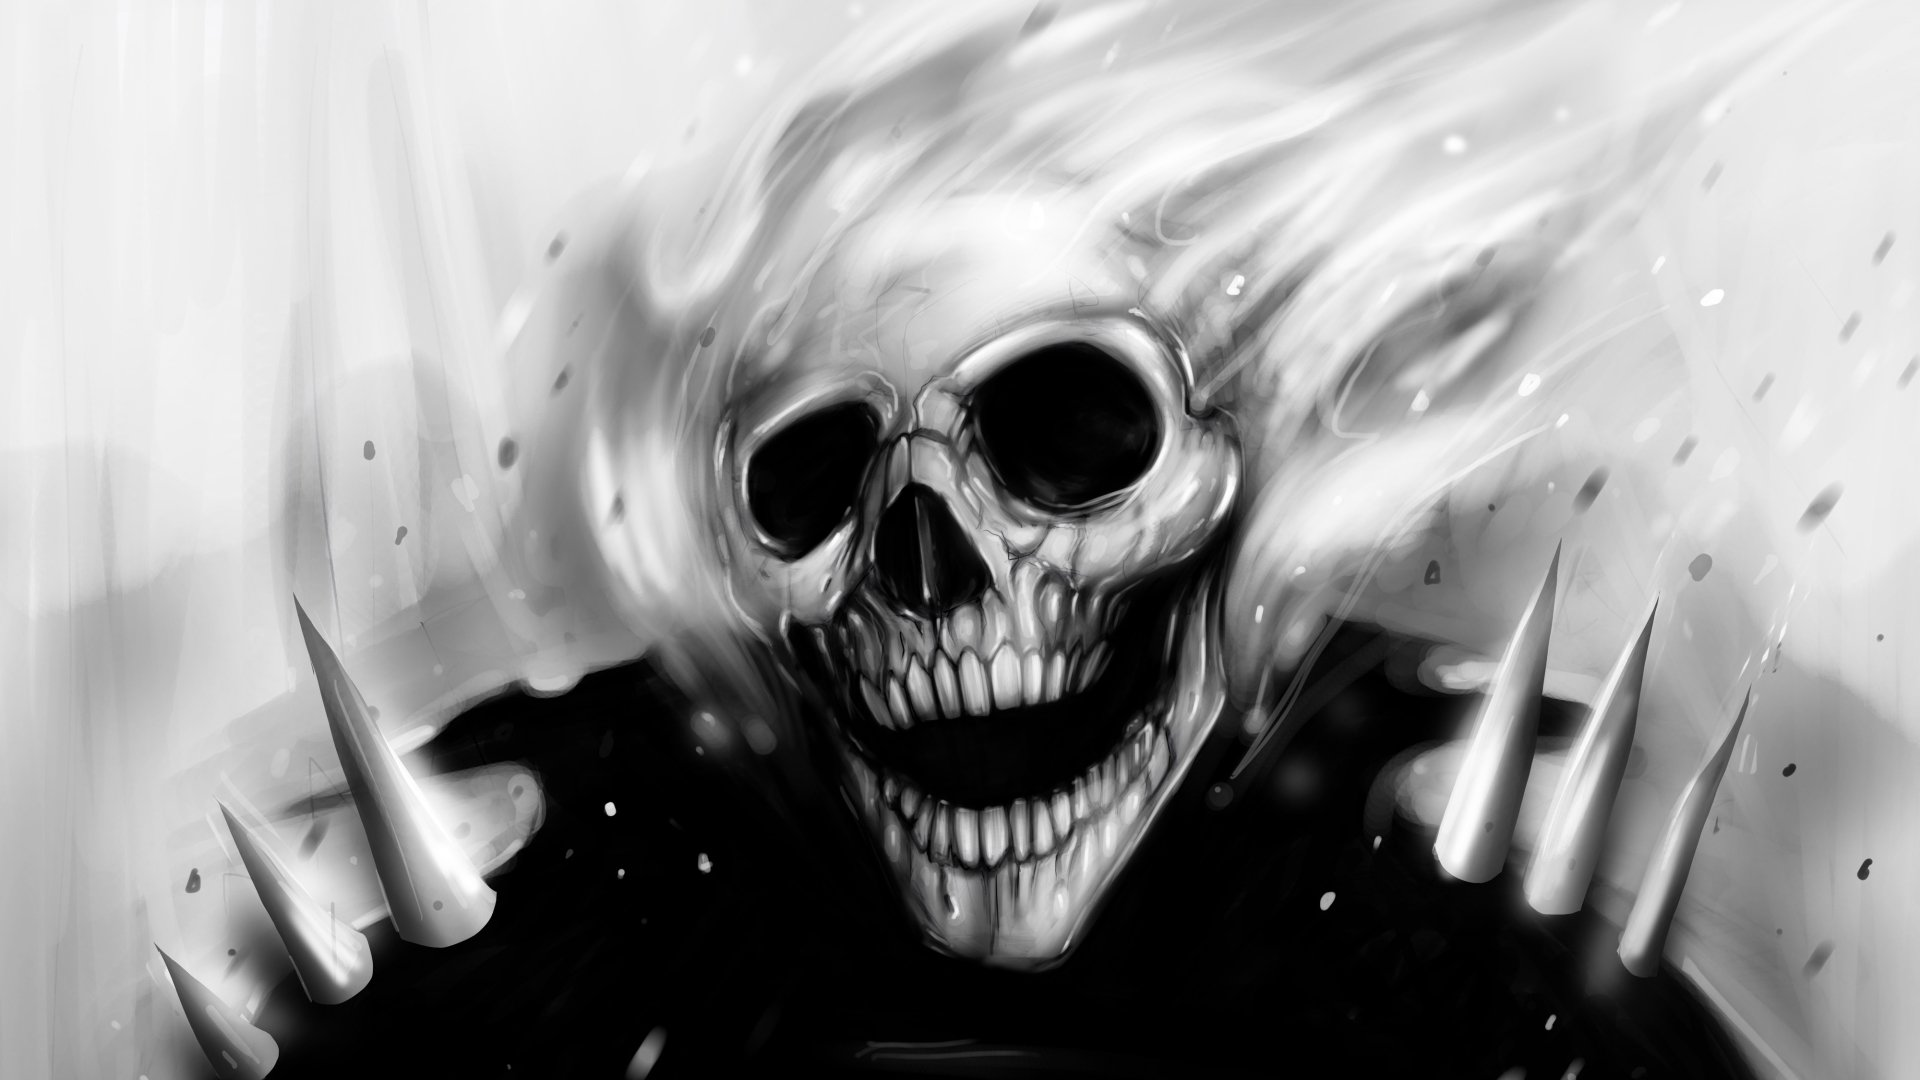 Comics - Ghost Rider  Creepy Skull Wallpaper